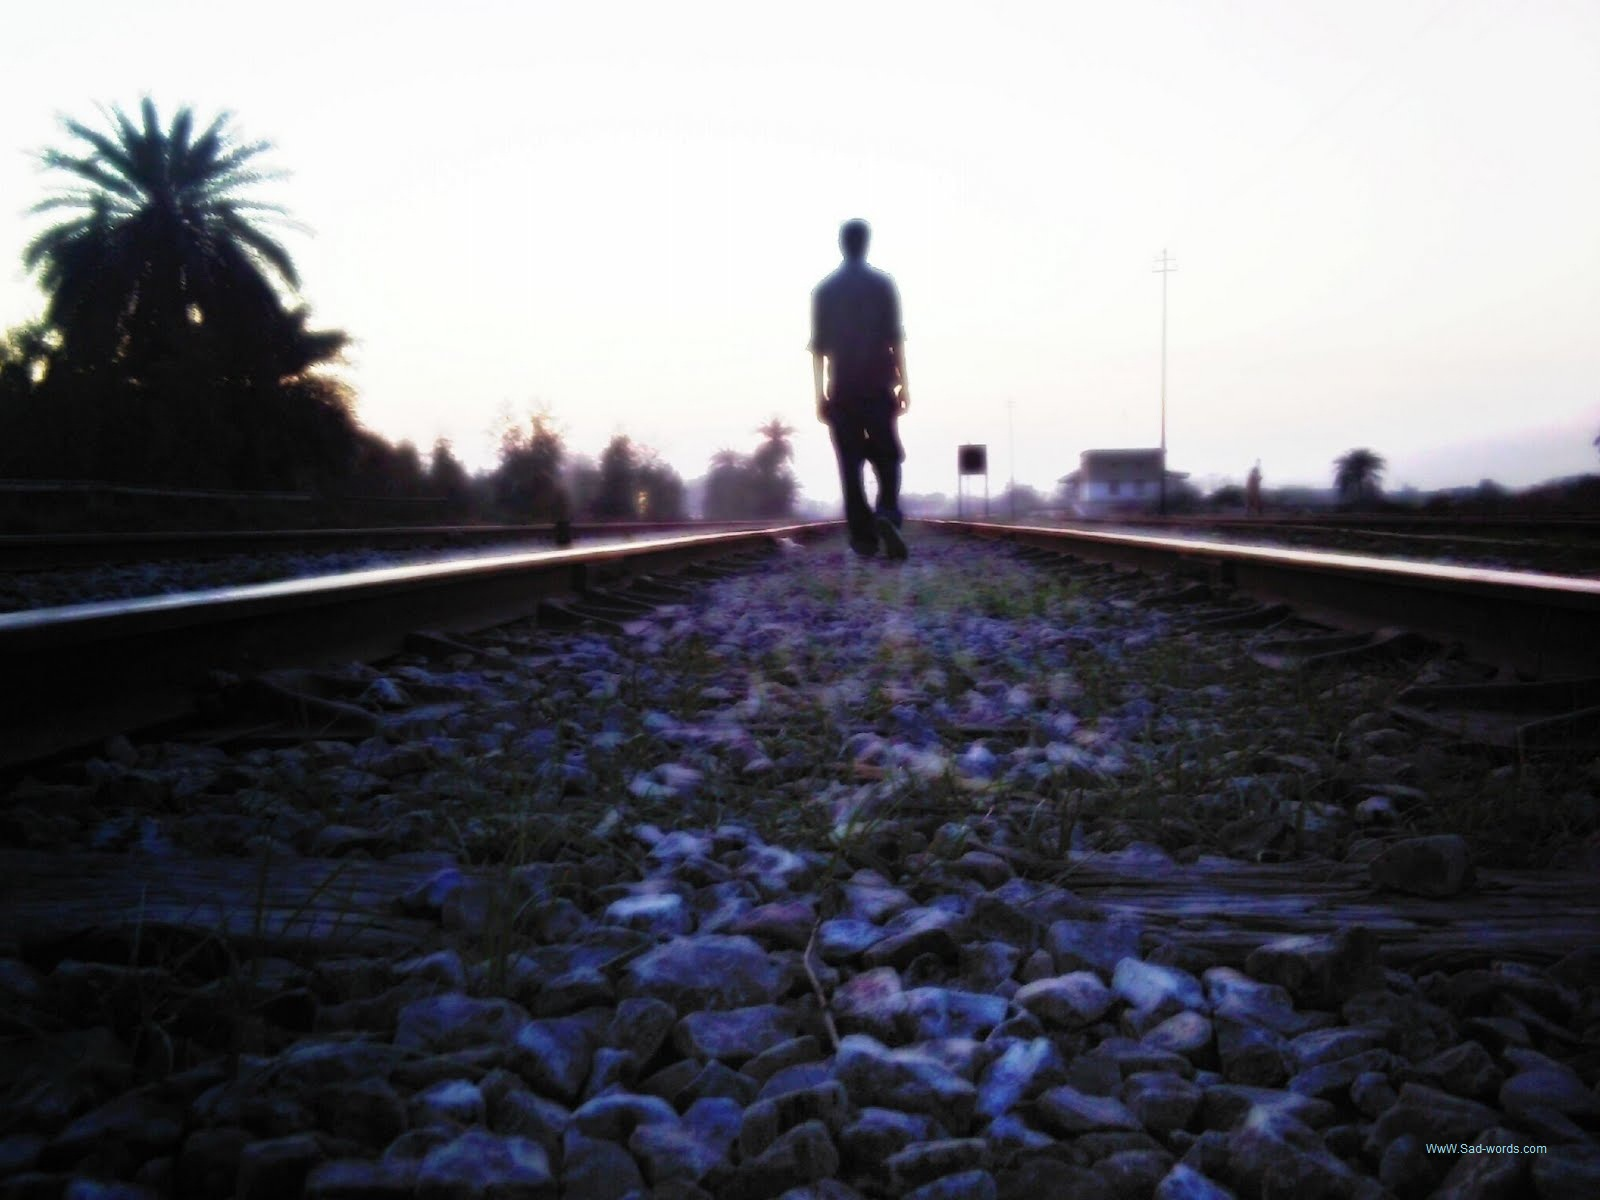 بالصور صور حزينه معبره , عبارات مؤلمه عن الفراق والوداع 2141 8